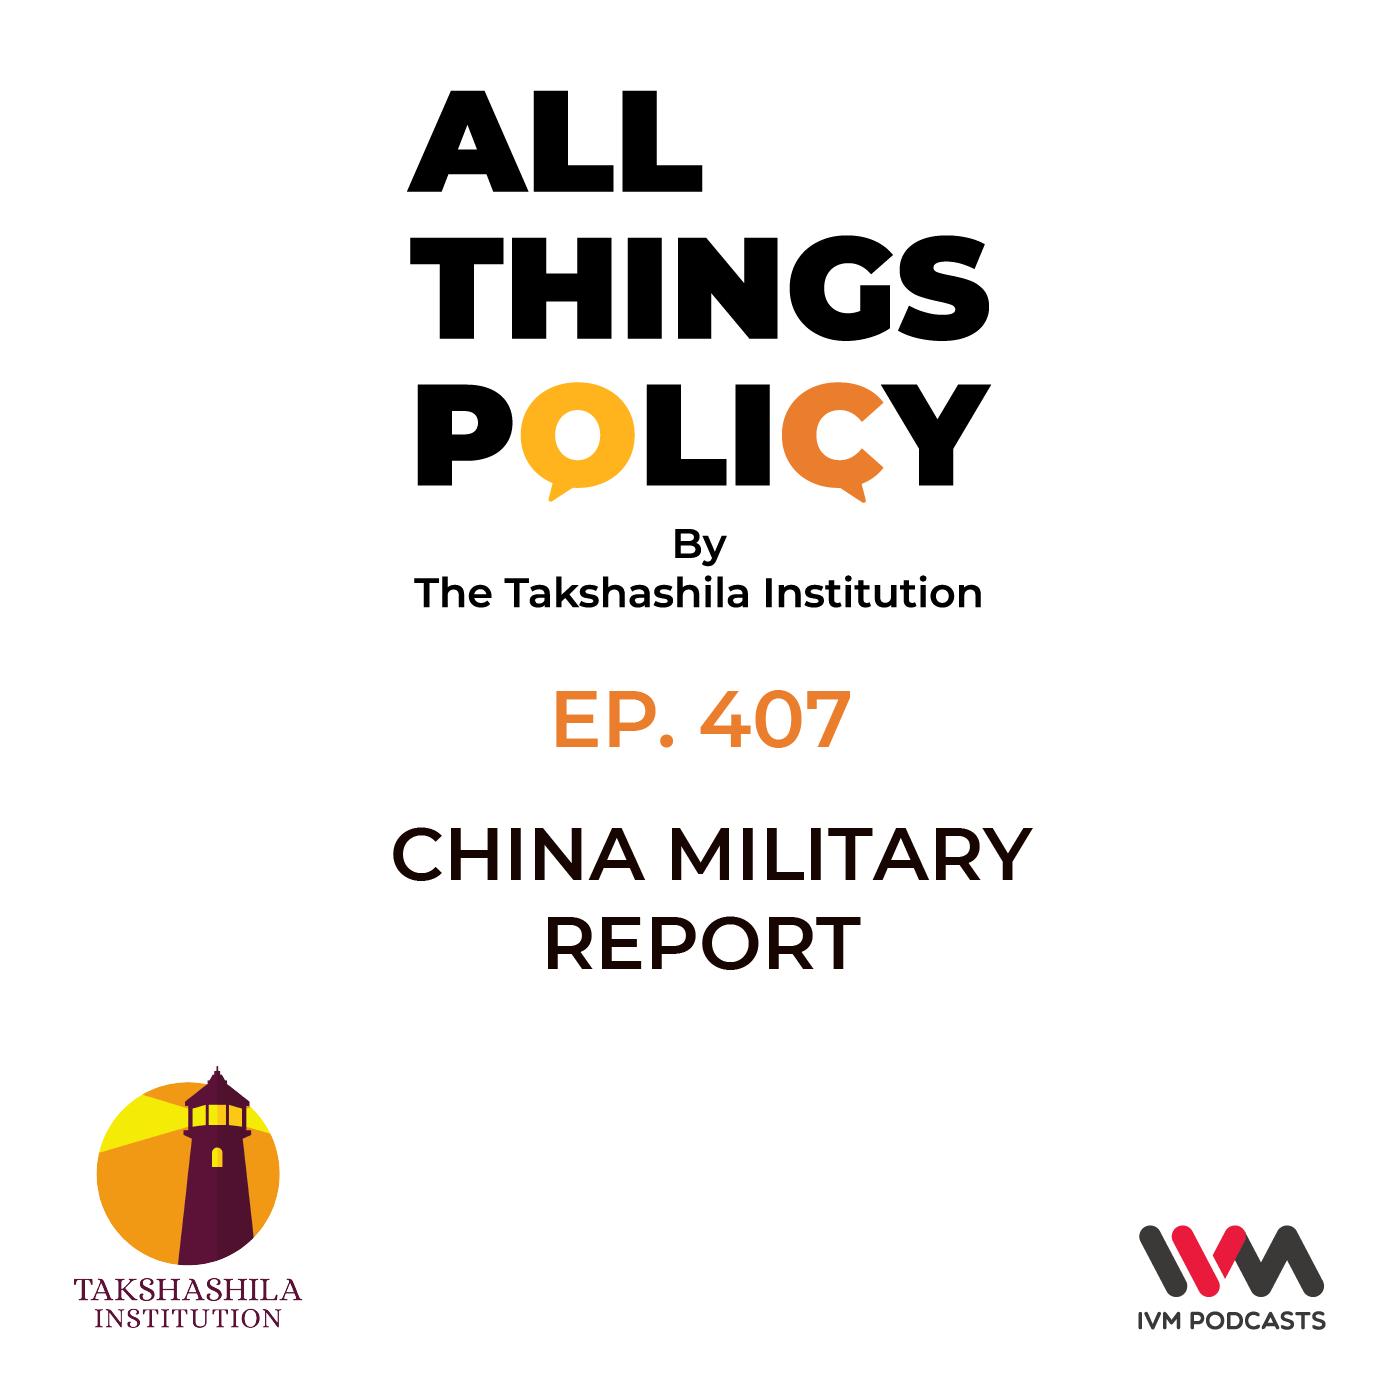 Ep. 407: China Military Report